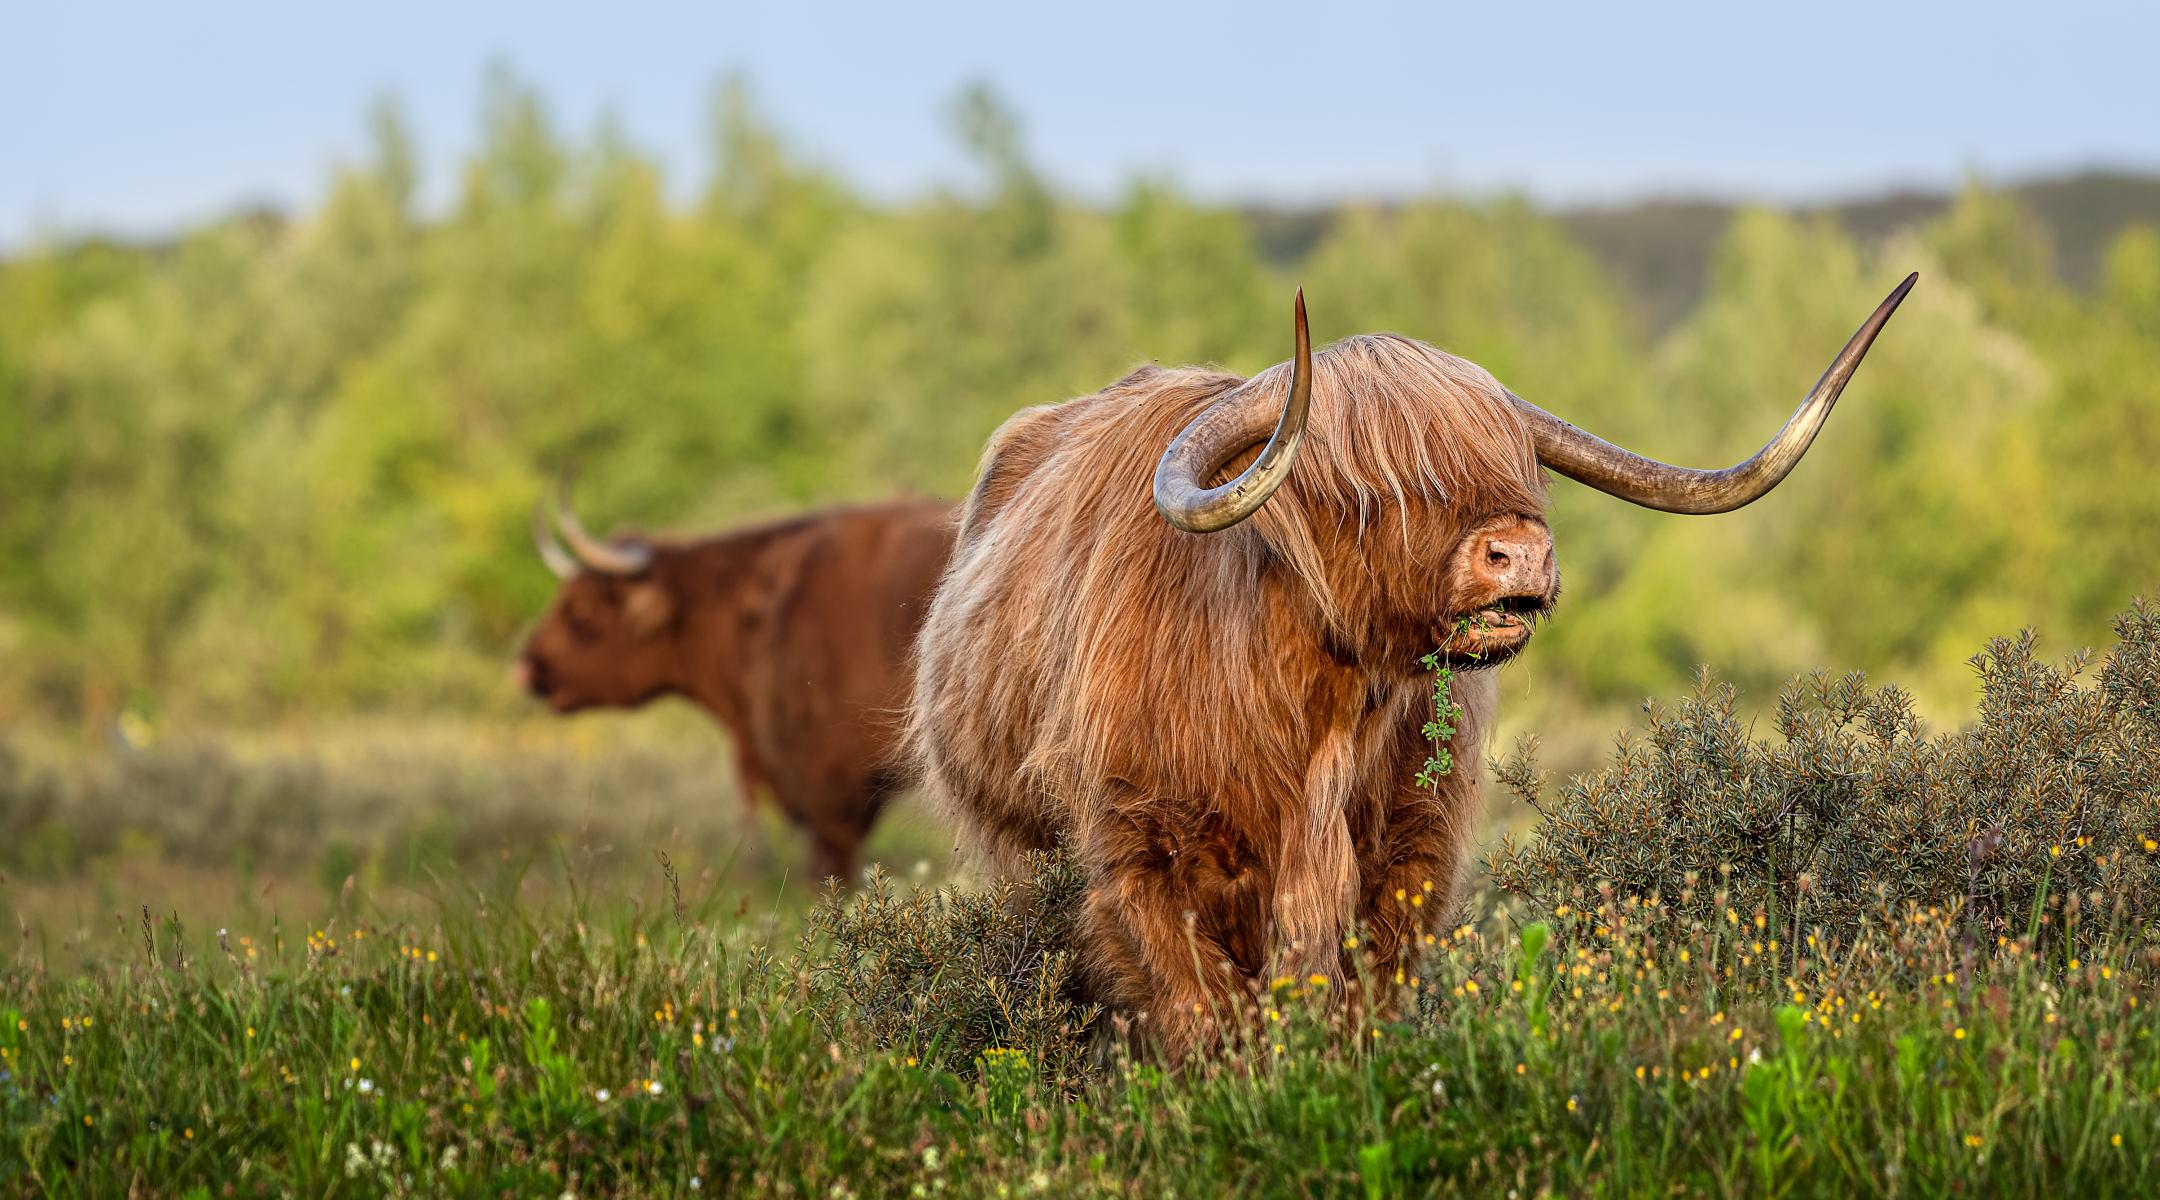 mighty higland bull munching on some juicy greenery